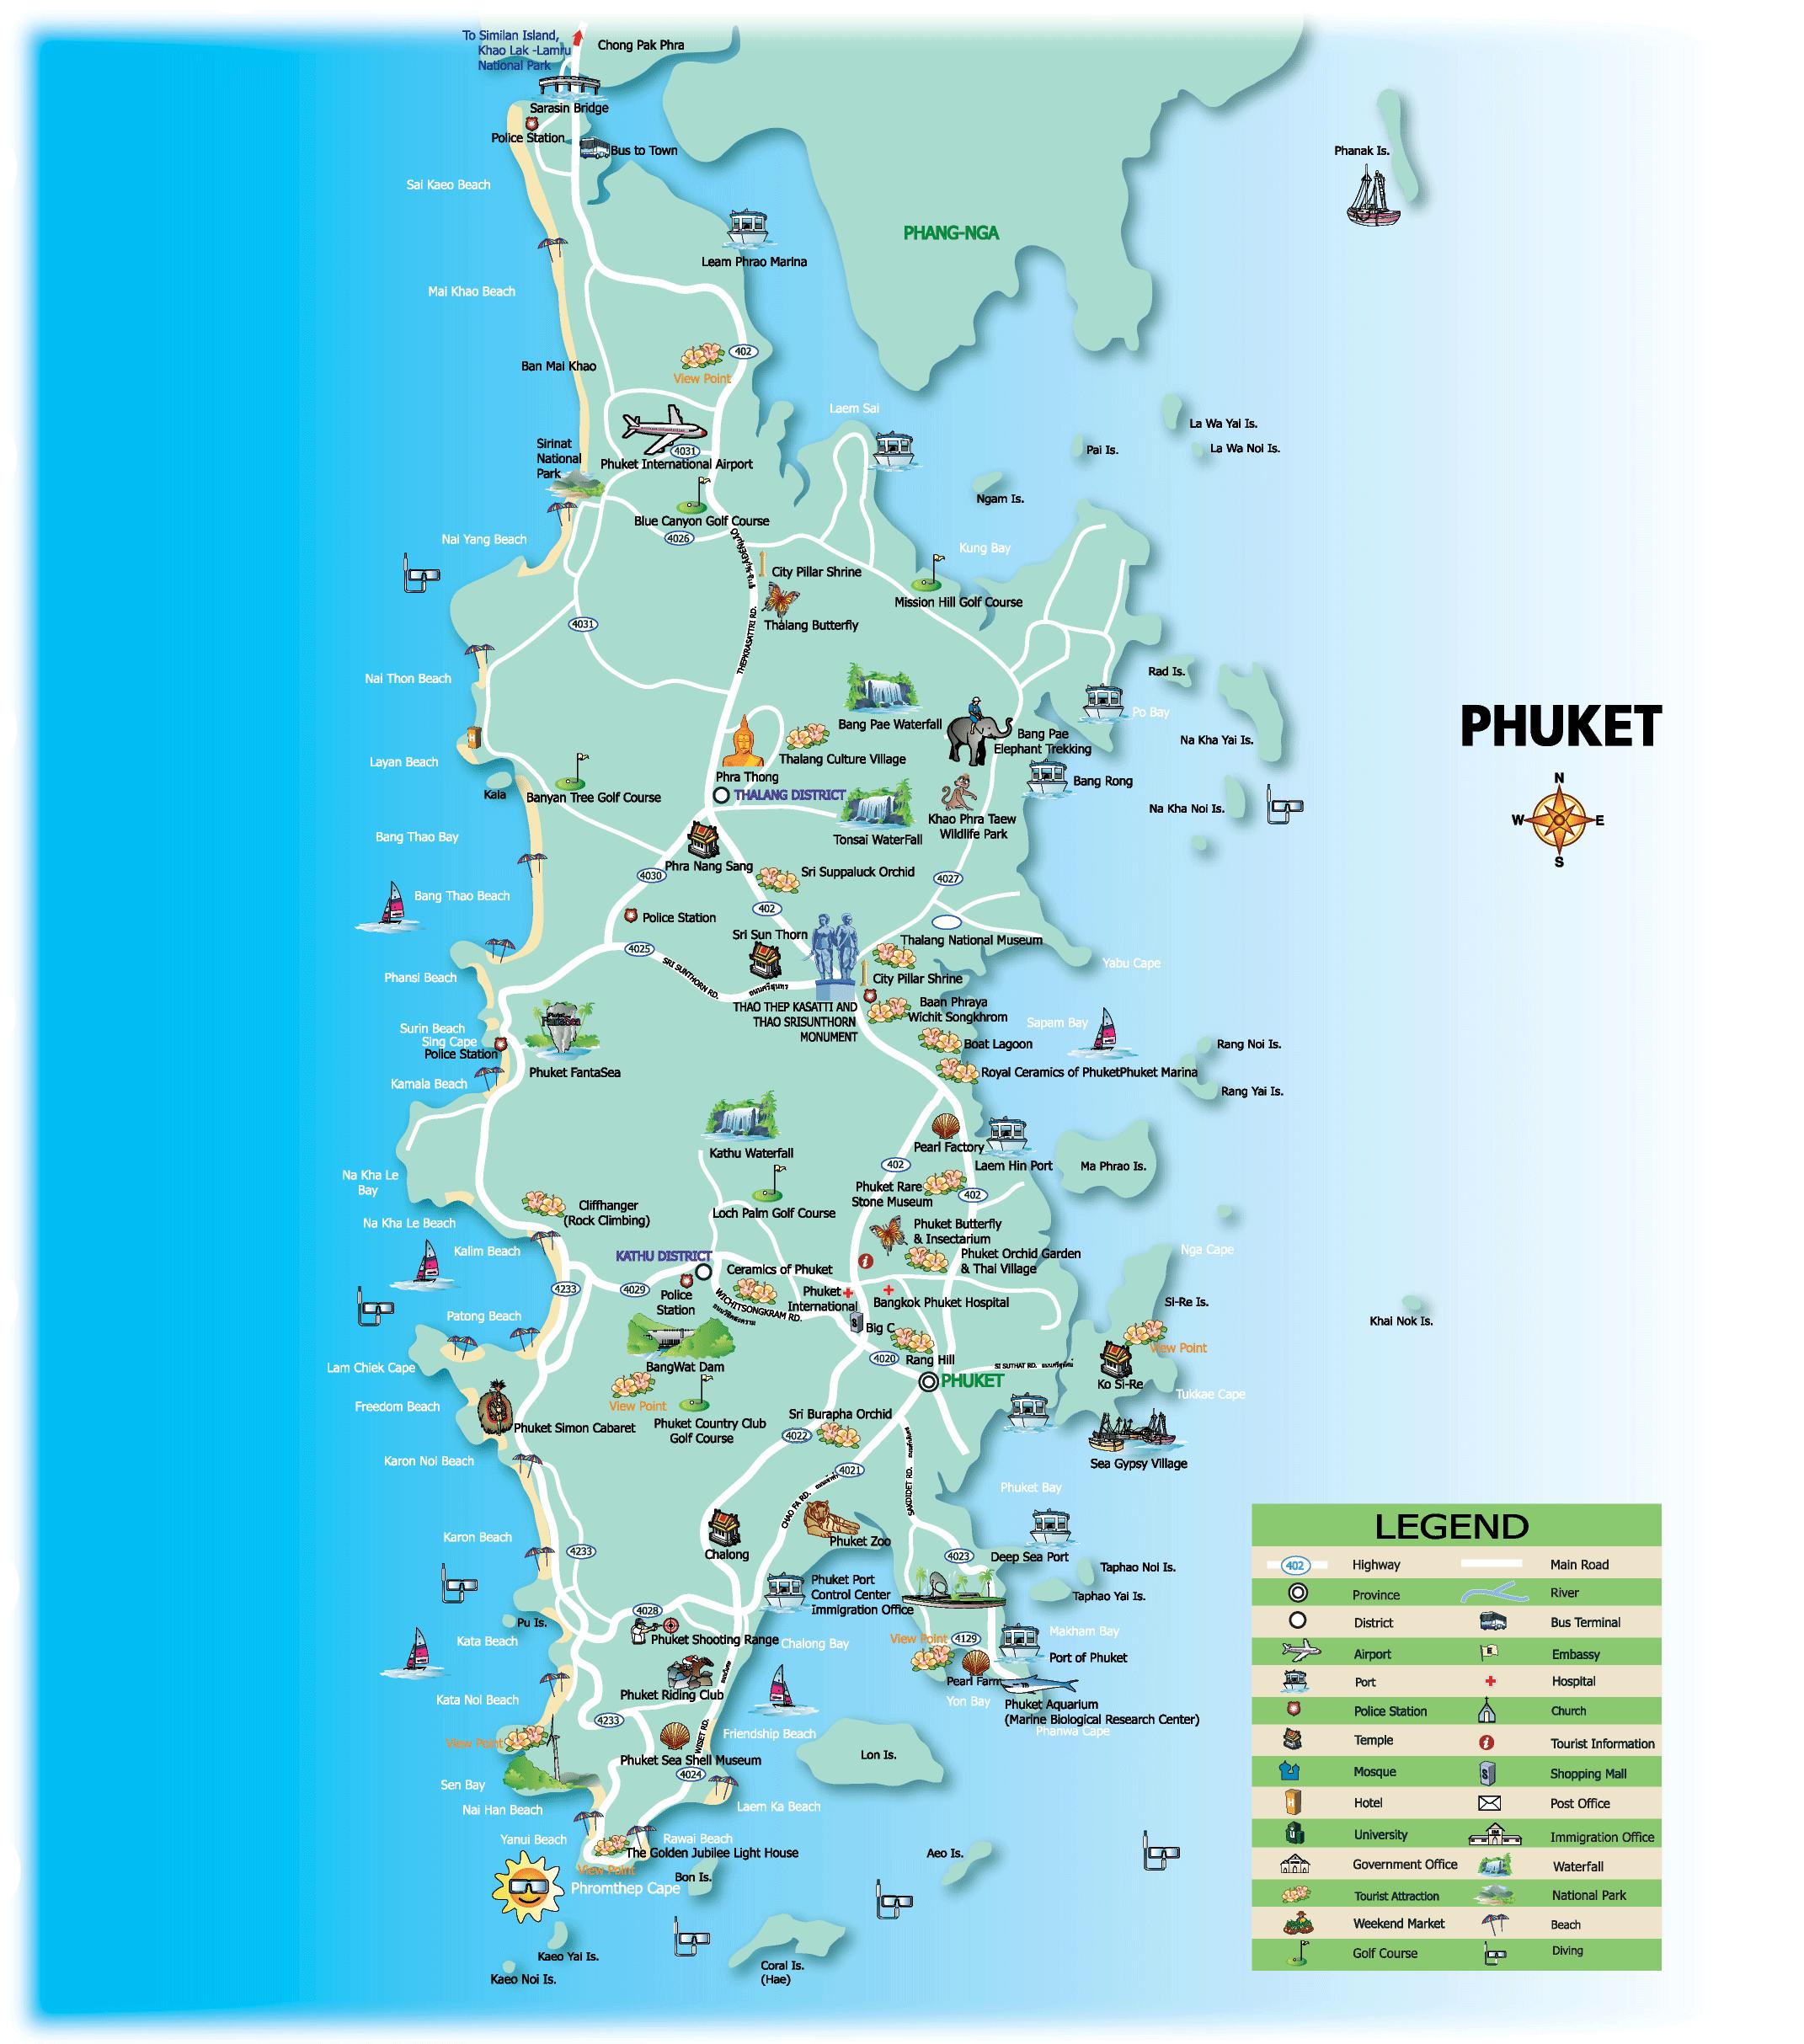 https://bbagamon.files.wordpress.com/2011/06/phuket-tourist-map.png